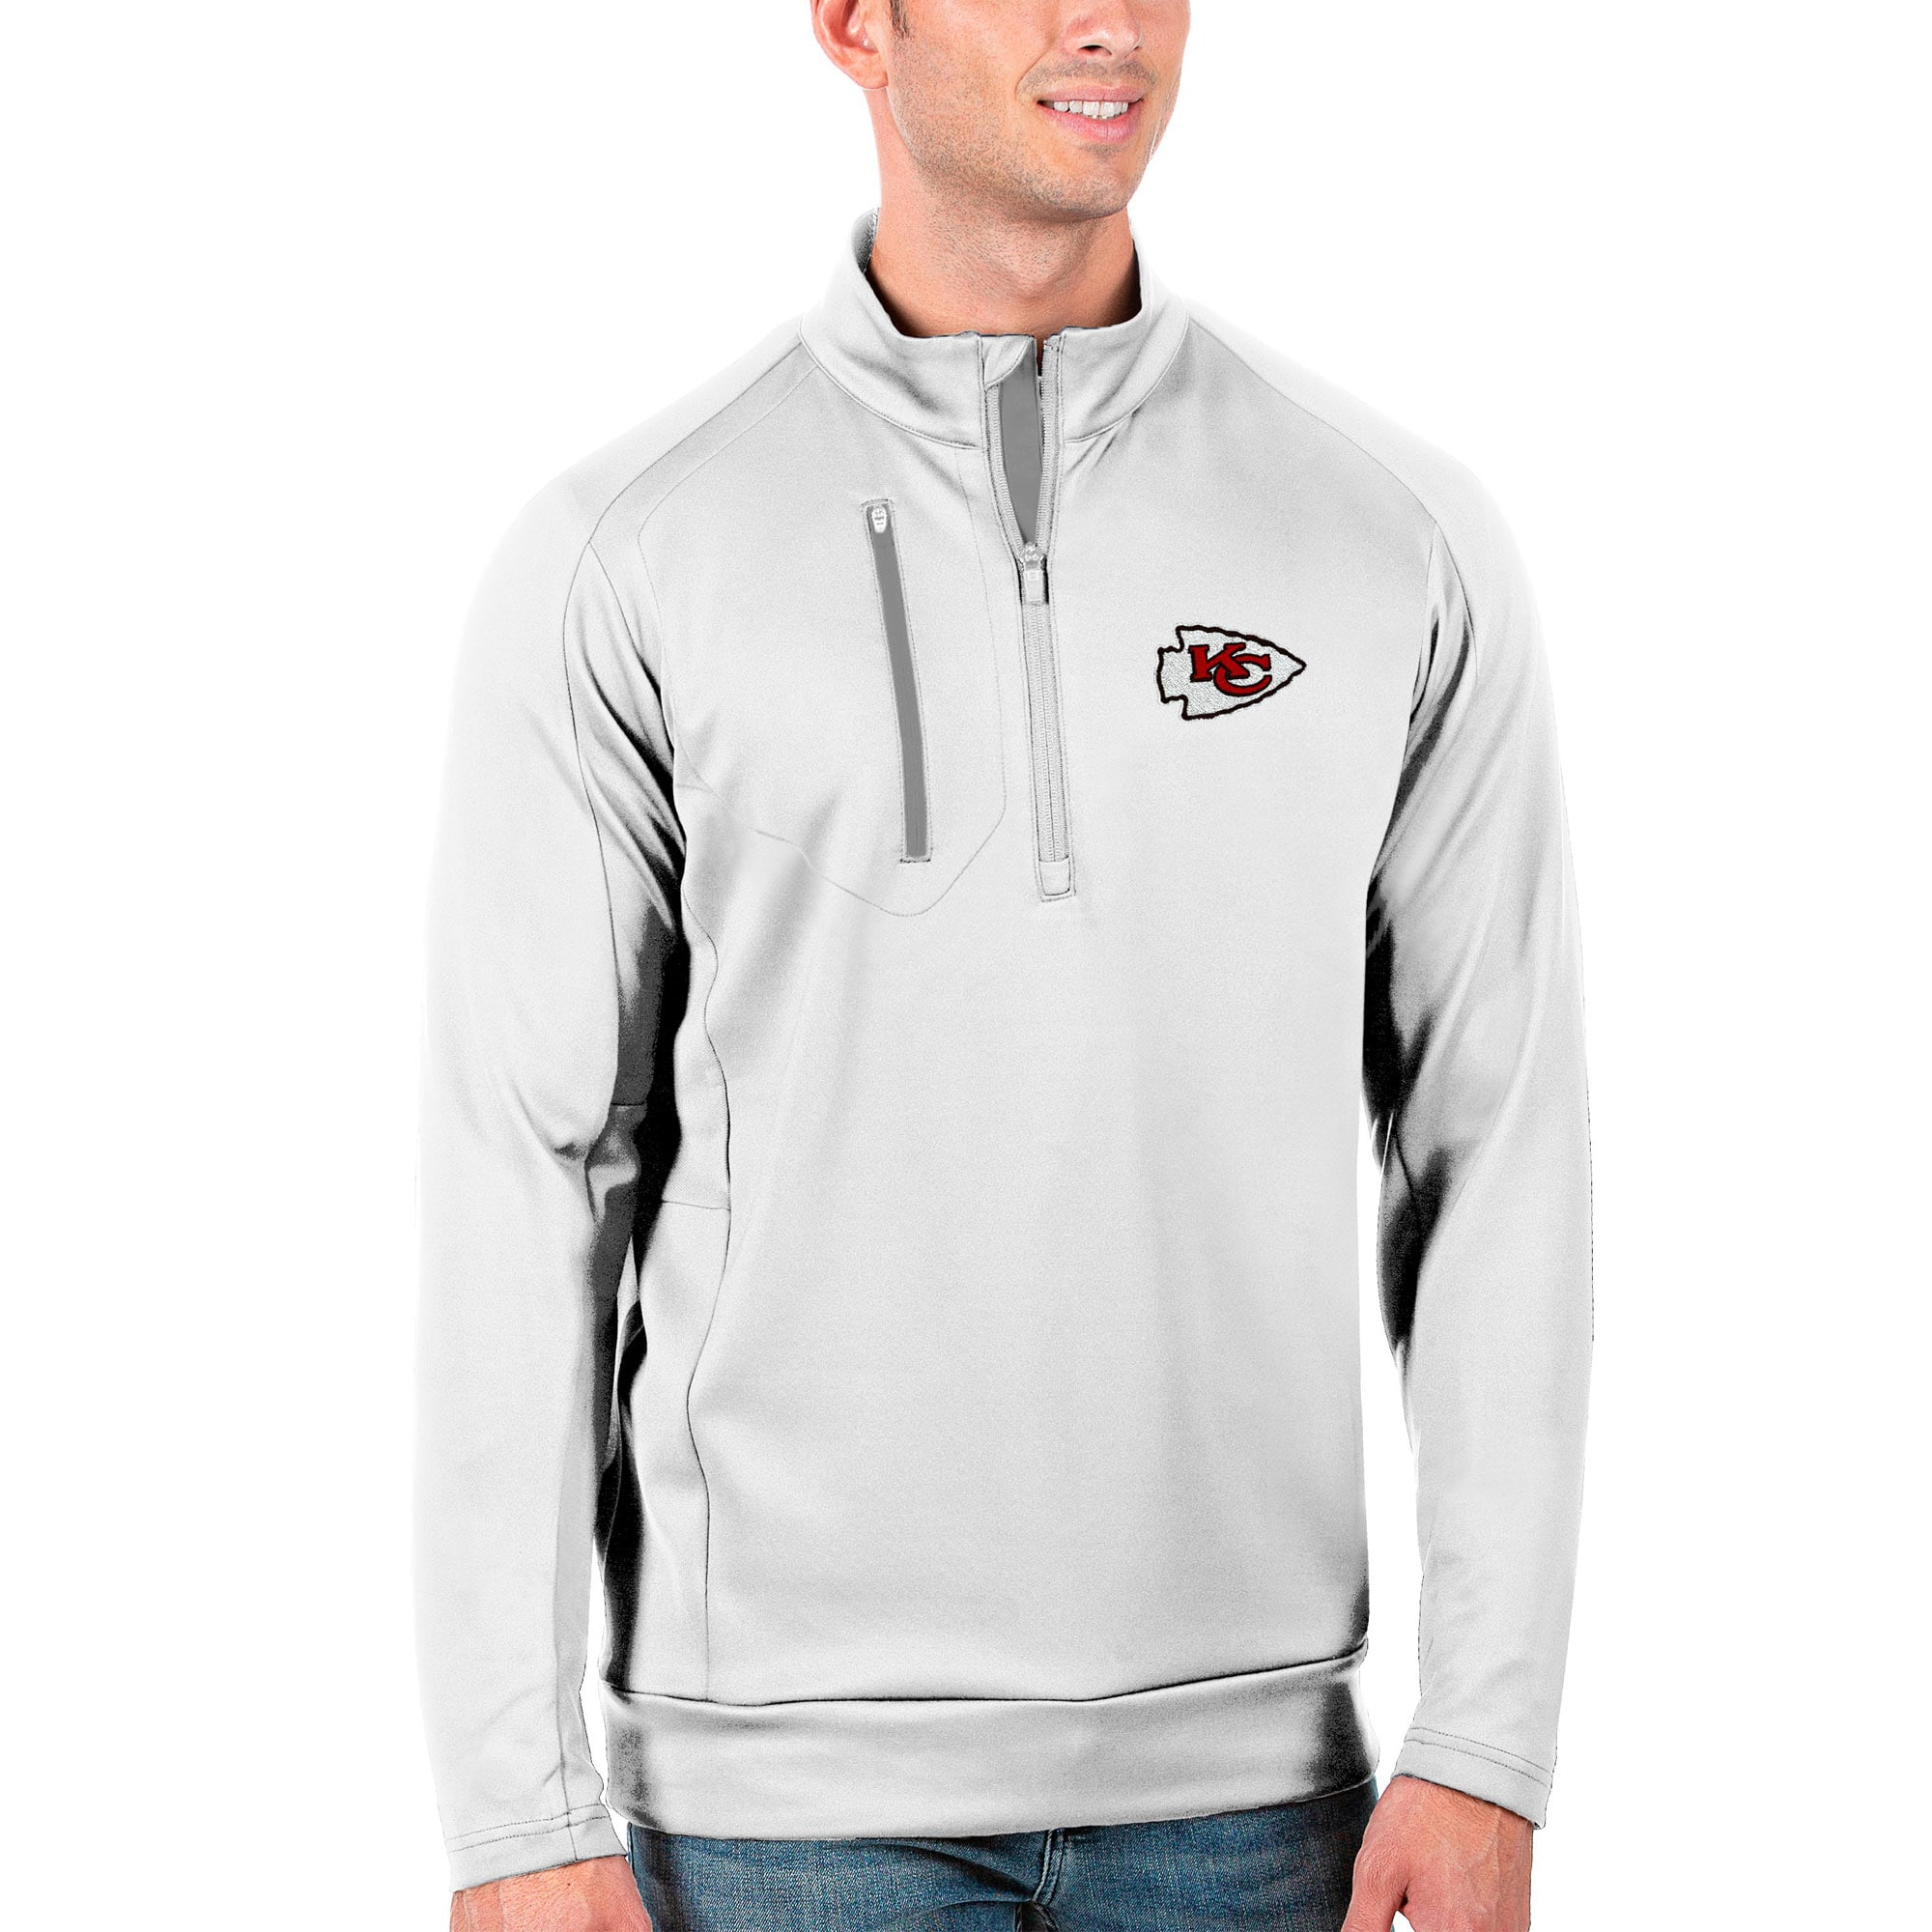 Kansas City Chiefs Antigua Generation Quarter-Zip Pullover Jacket - White/Silver